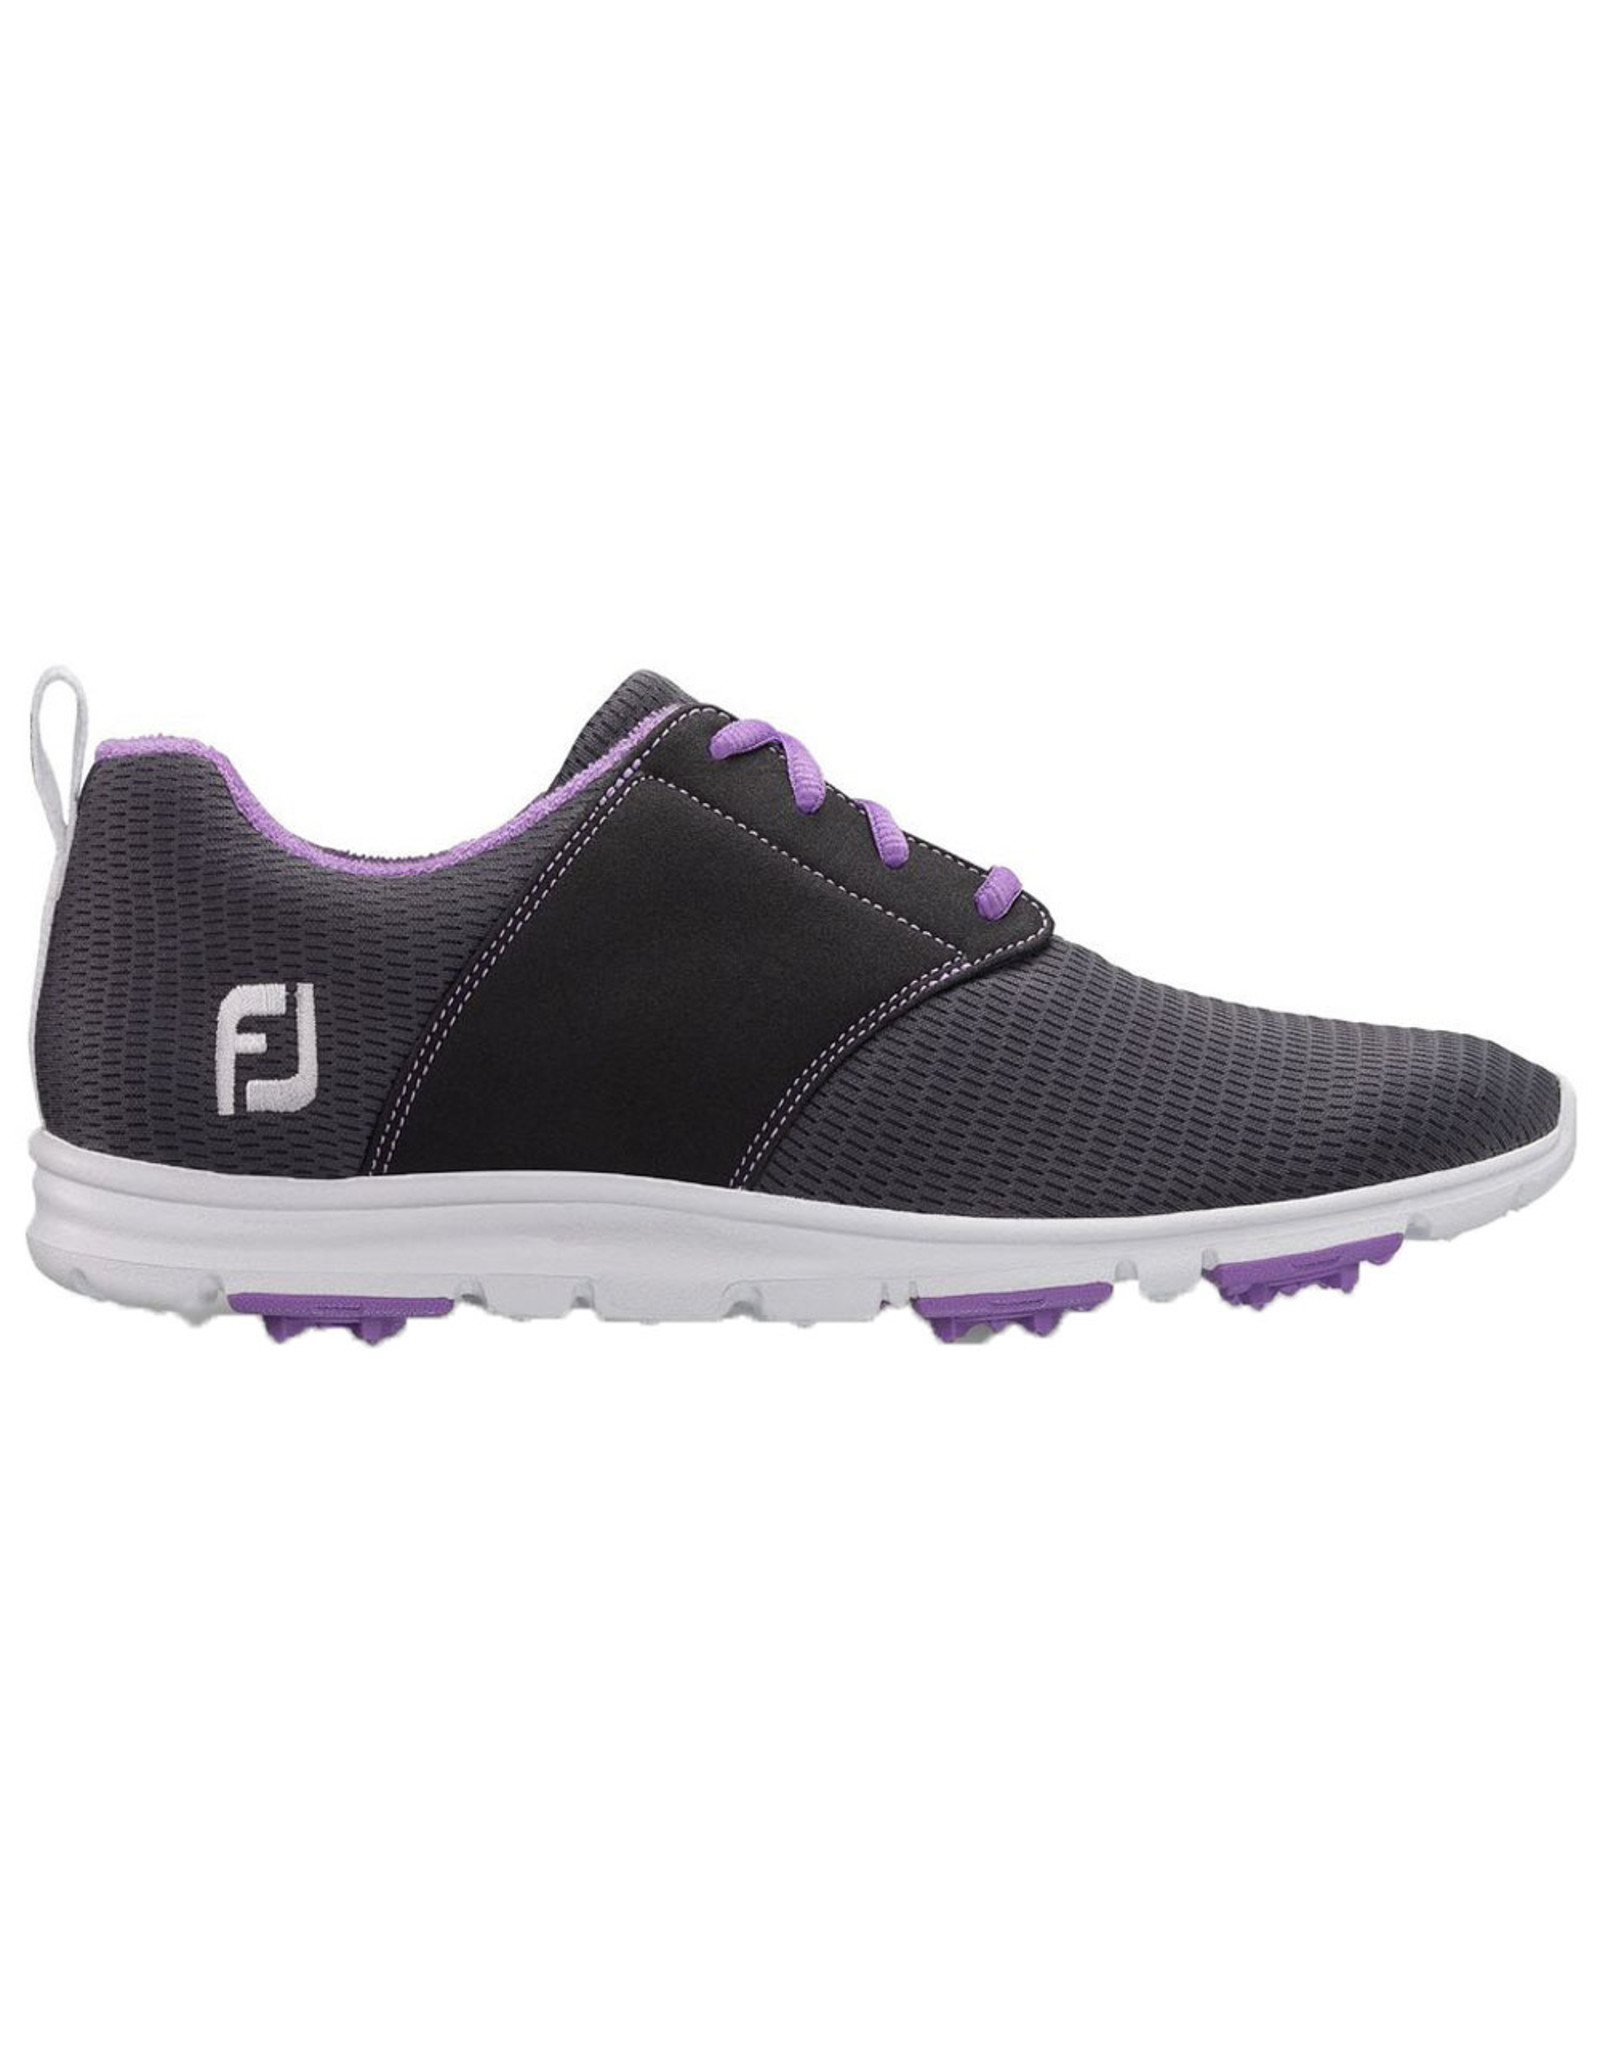 Footjoy FJ Enjoy Women's Shoes